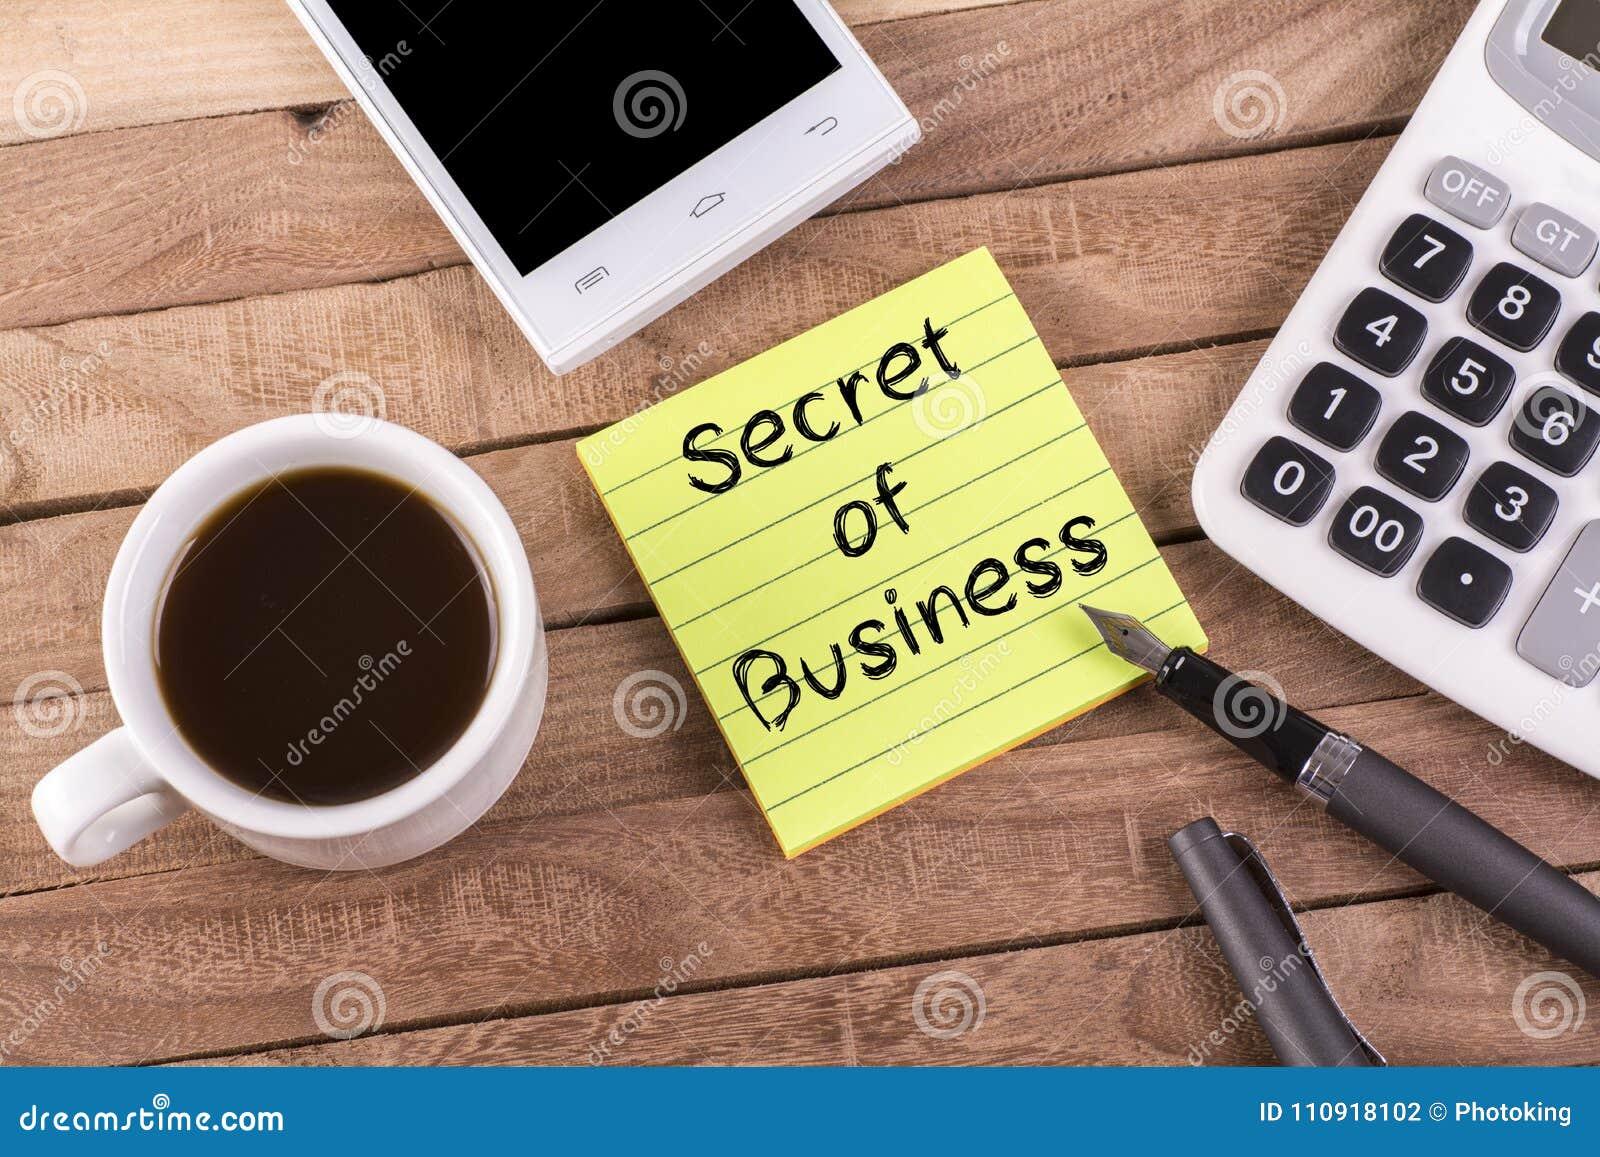 Secret of business on memo stock photo  Image of calculator - 110918102